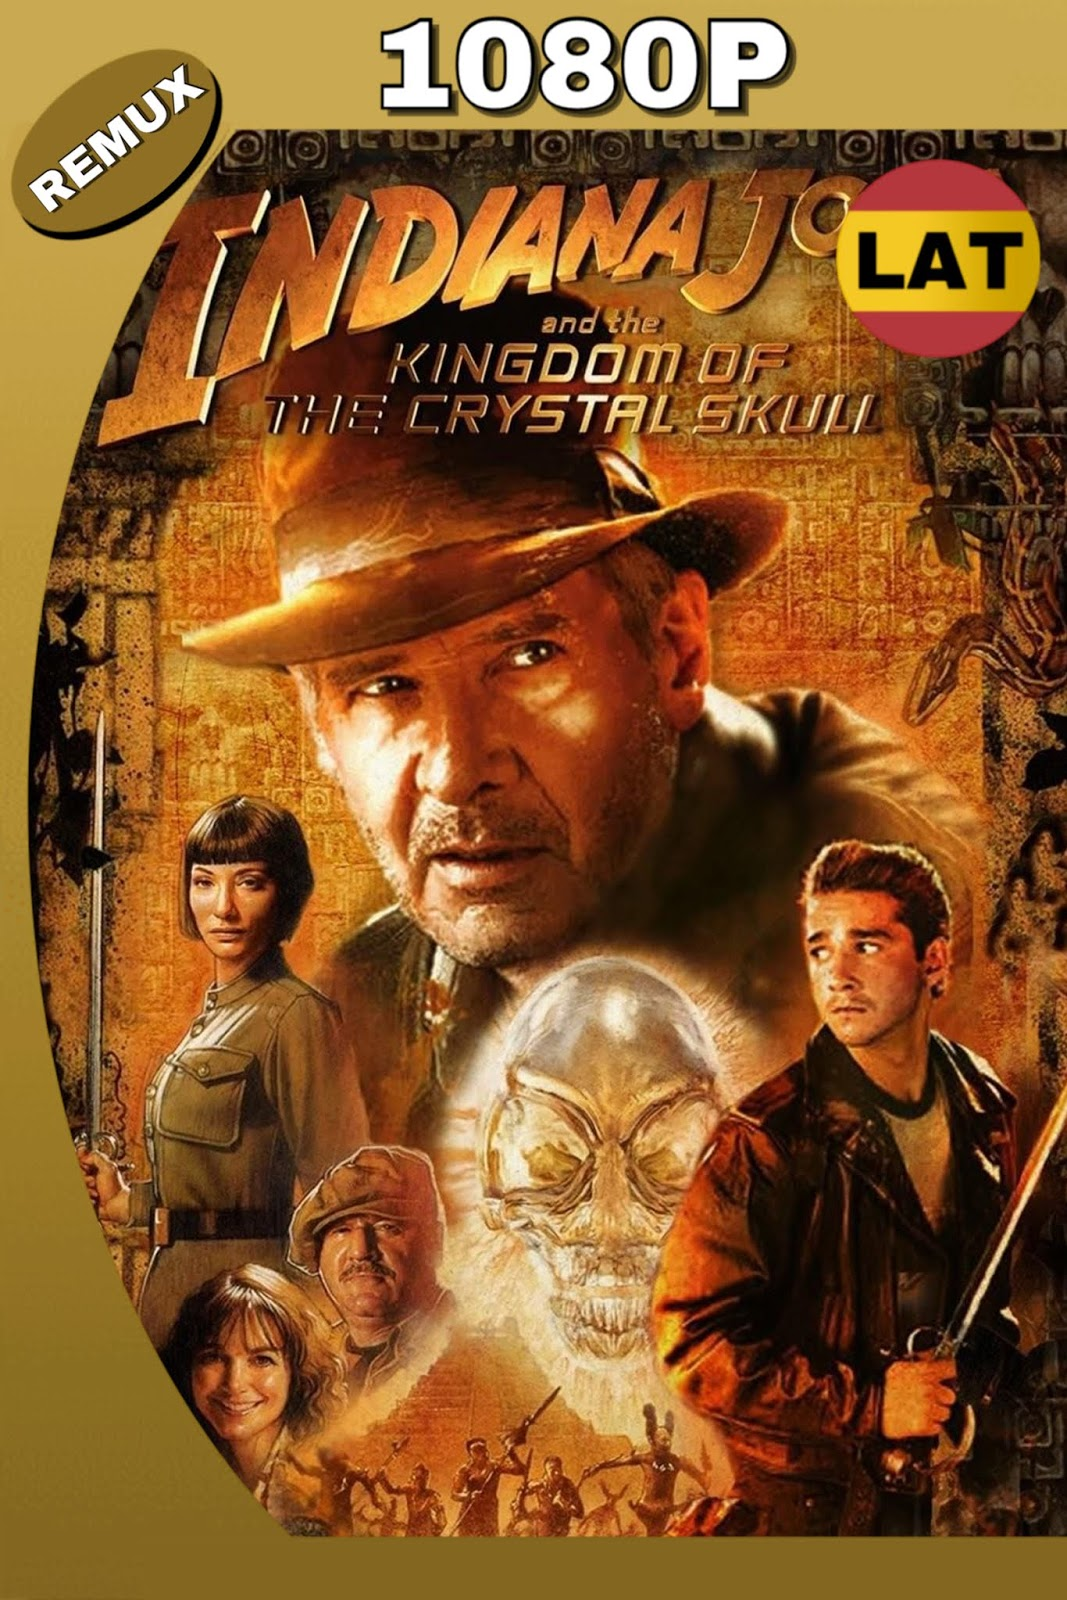 INDIANA JONES AND THE KINGDOM OF THE CRYSTAL SKULL 2008 LAT-ING BDREMUX 1080P 32GB.mkv